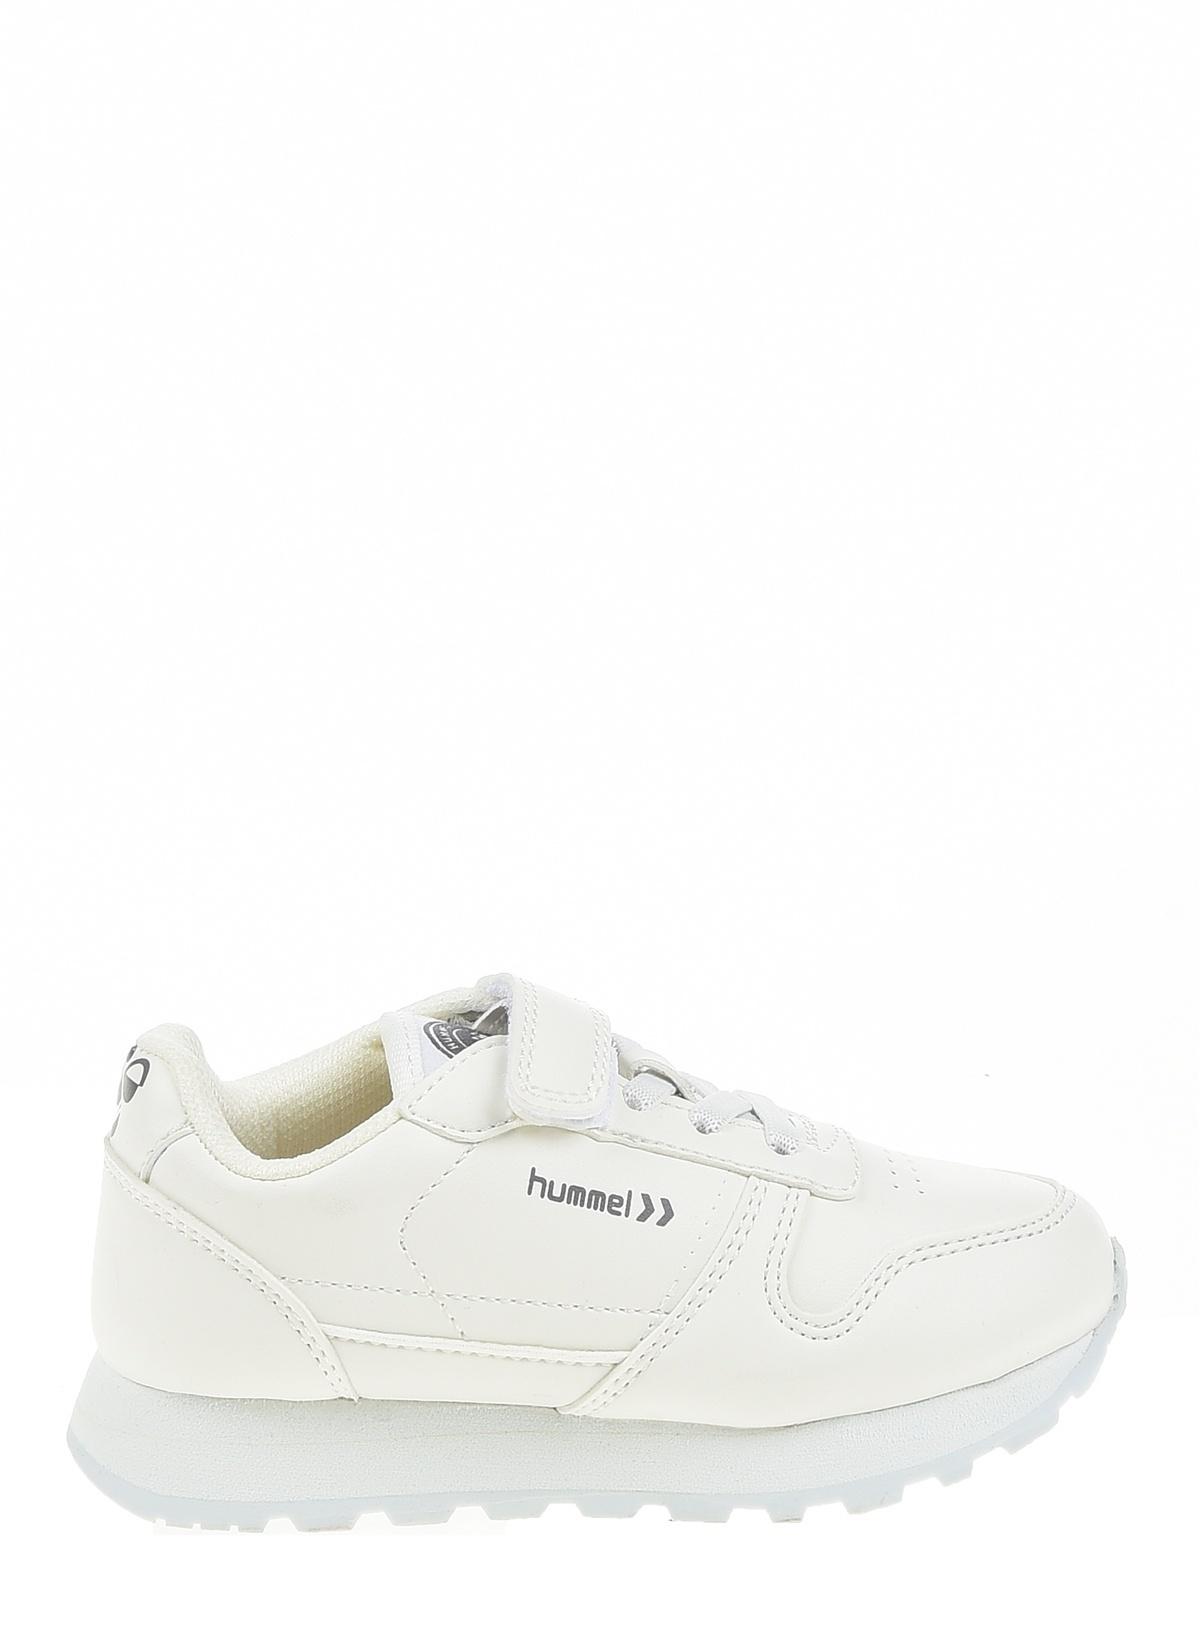 Hummel Unisex Cocuk Spor Ayakkabi White White Morhipo 23436748